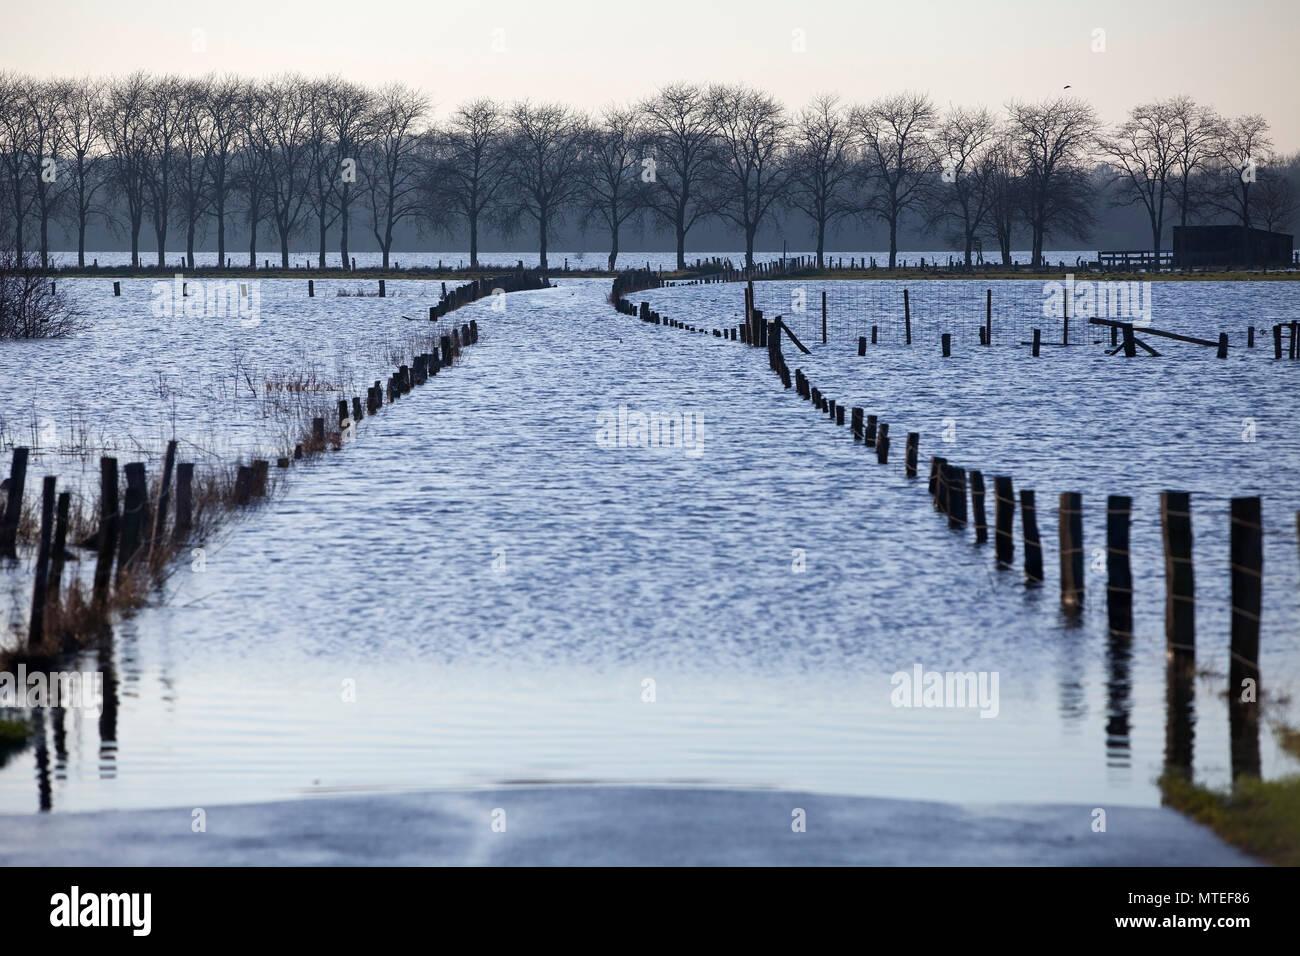 Road to Bislicher Insel at high tide on the Lower Rhine, North Rhine-Westphalia, Germany Stock Photo